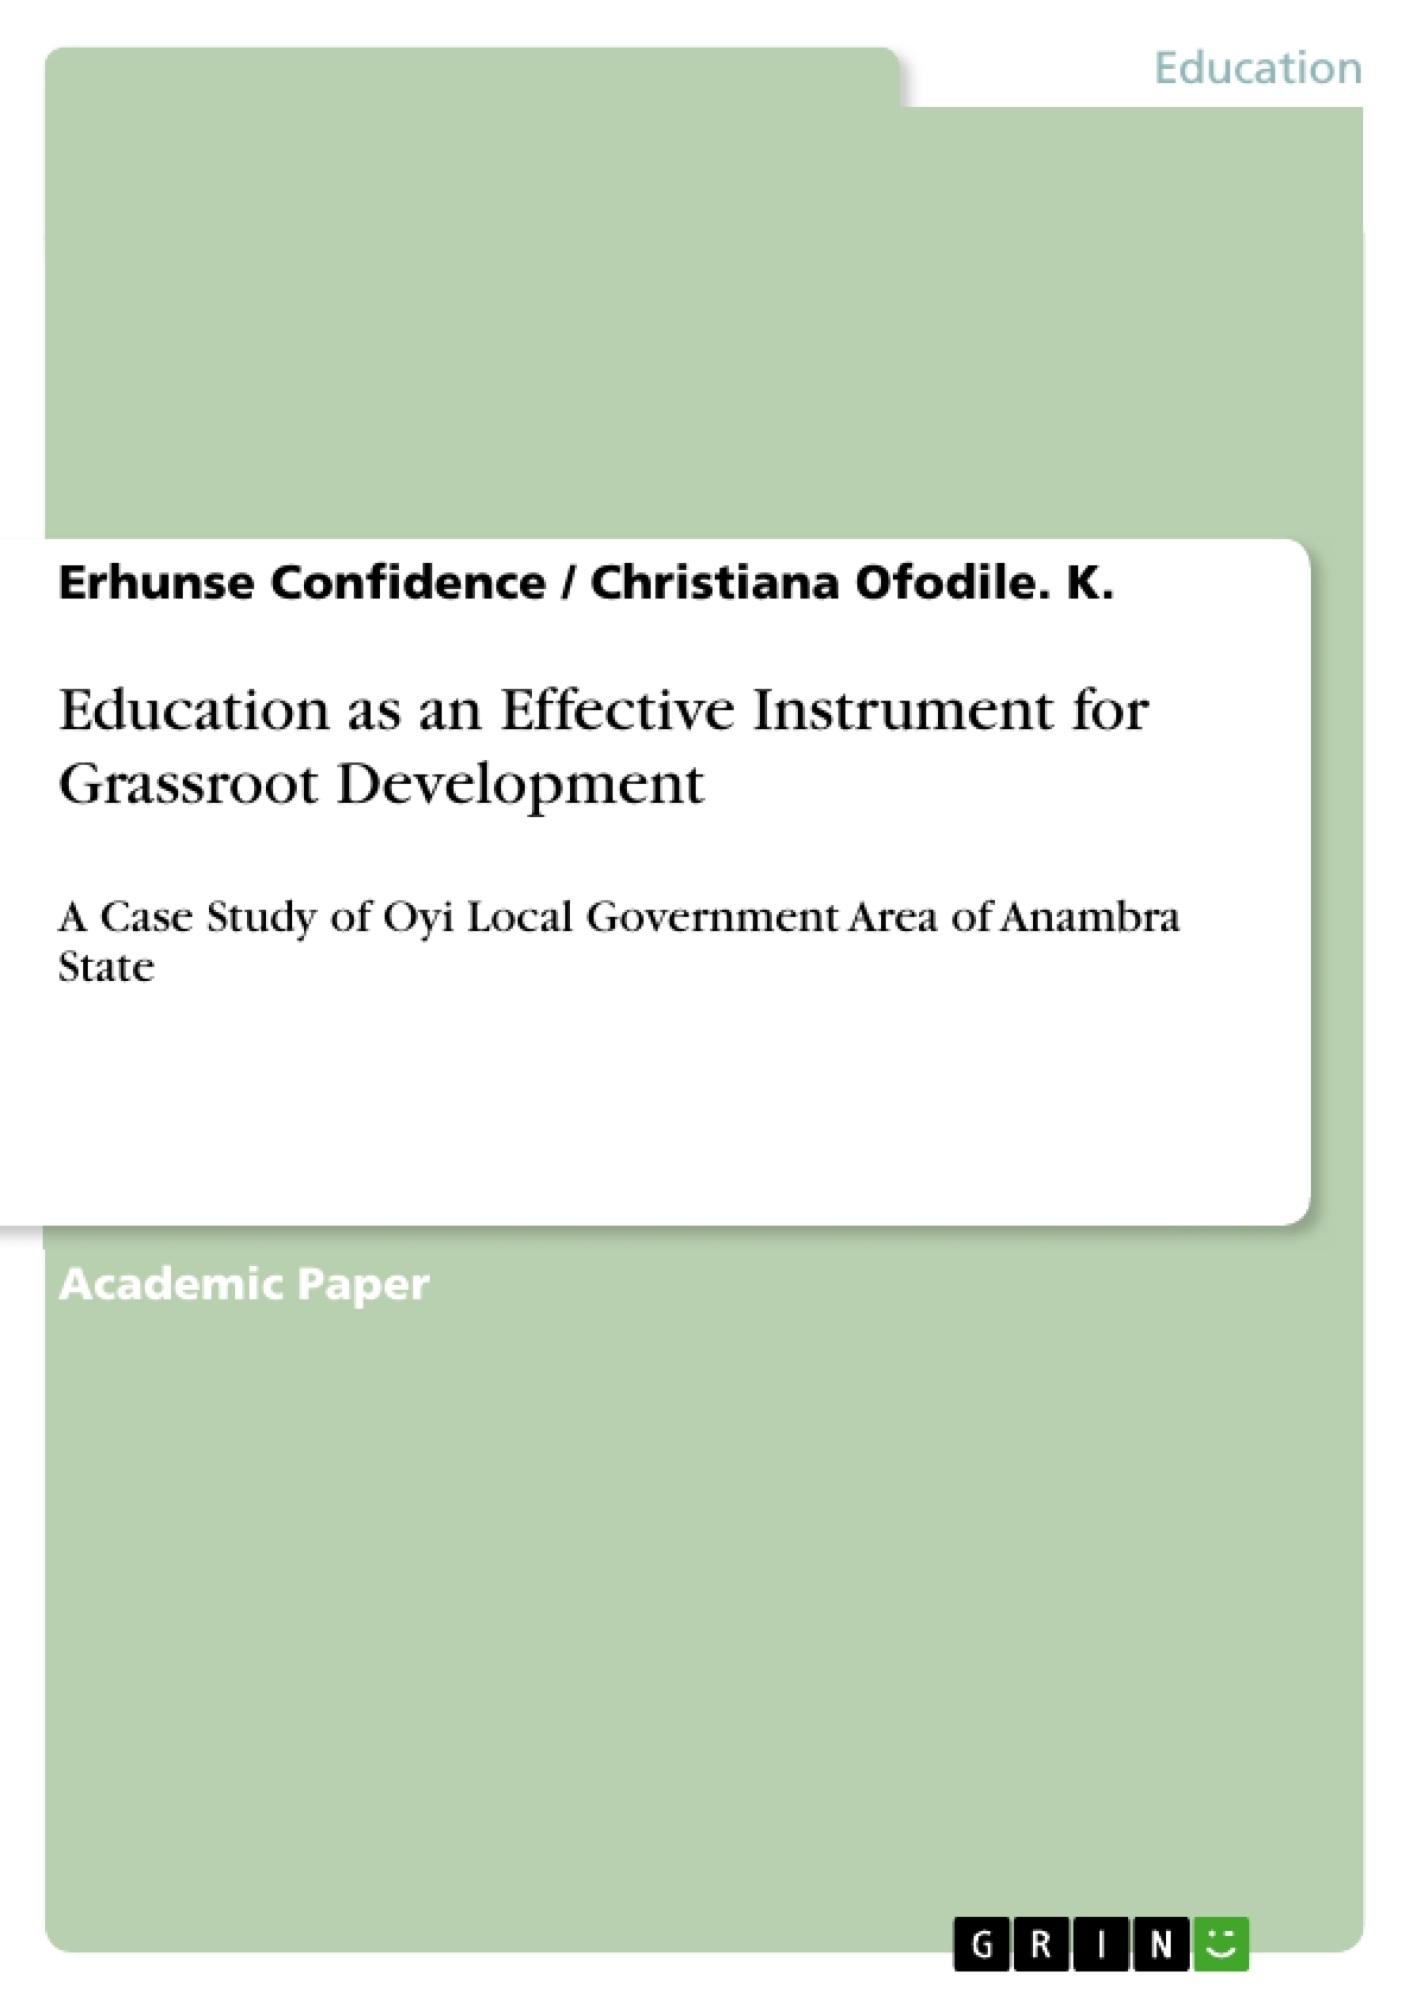 Title: Education as an Effective Instrument for Grassroot Development